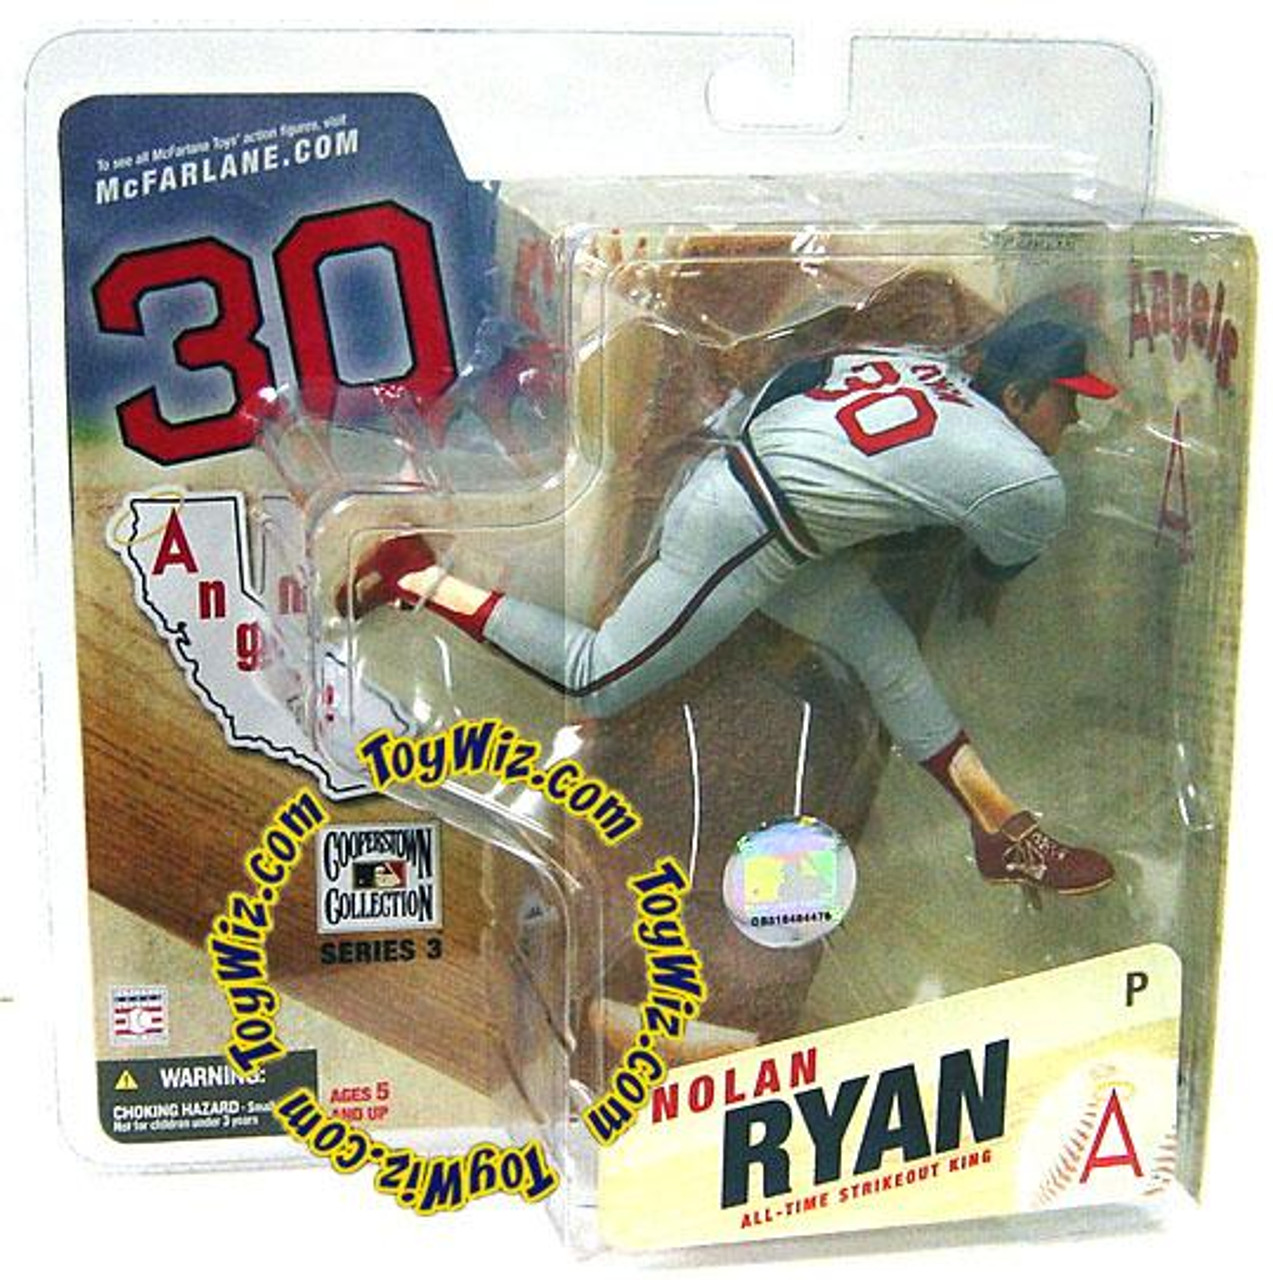 McFarlane Toys MLB Cooperstown Collection Series 3 Nolan Ryan Action Figure [Angels Uniform]